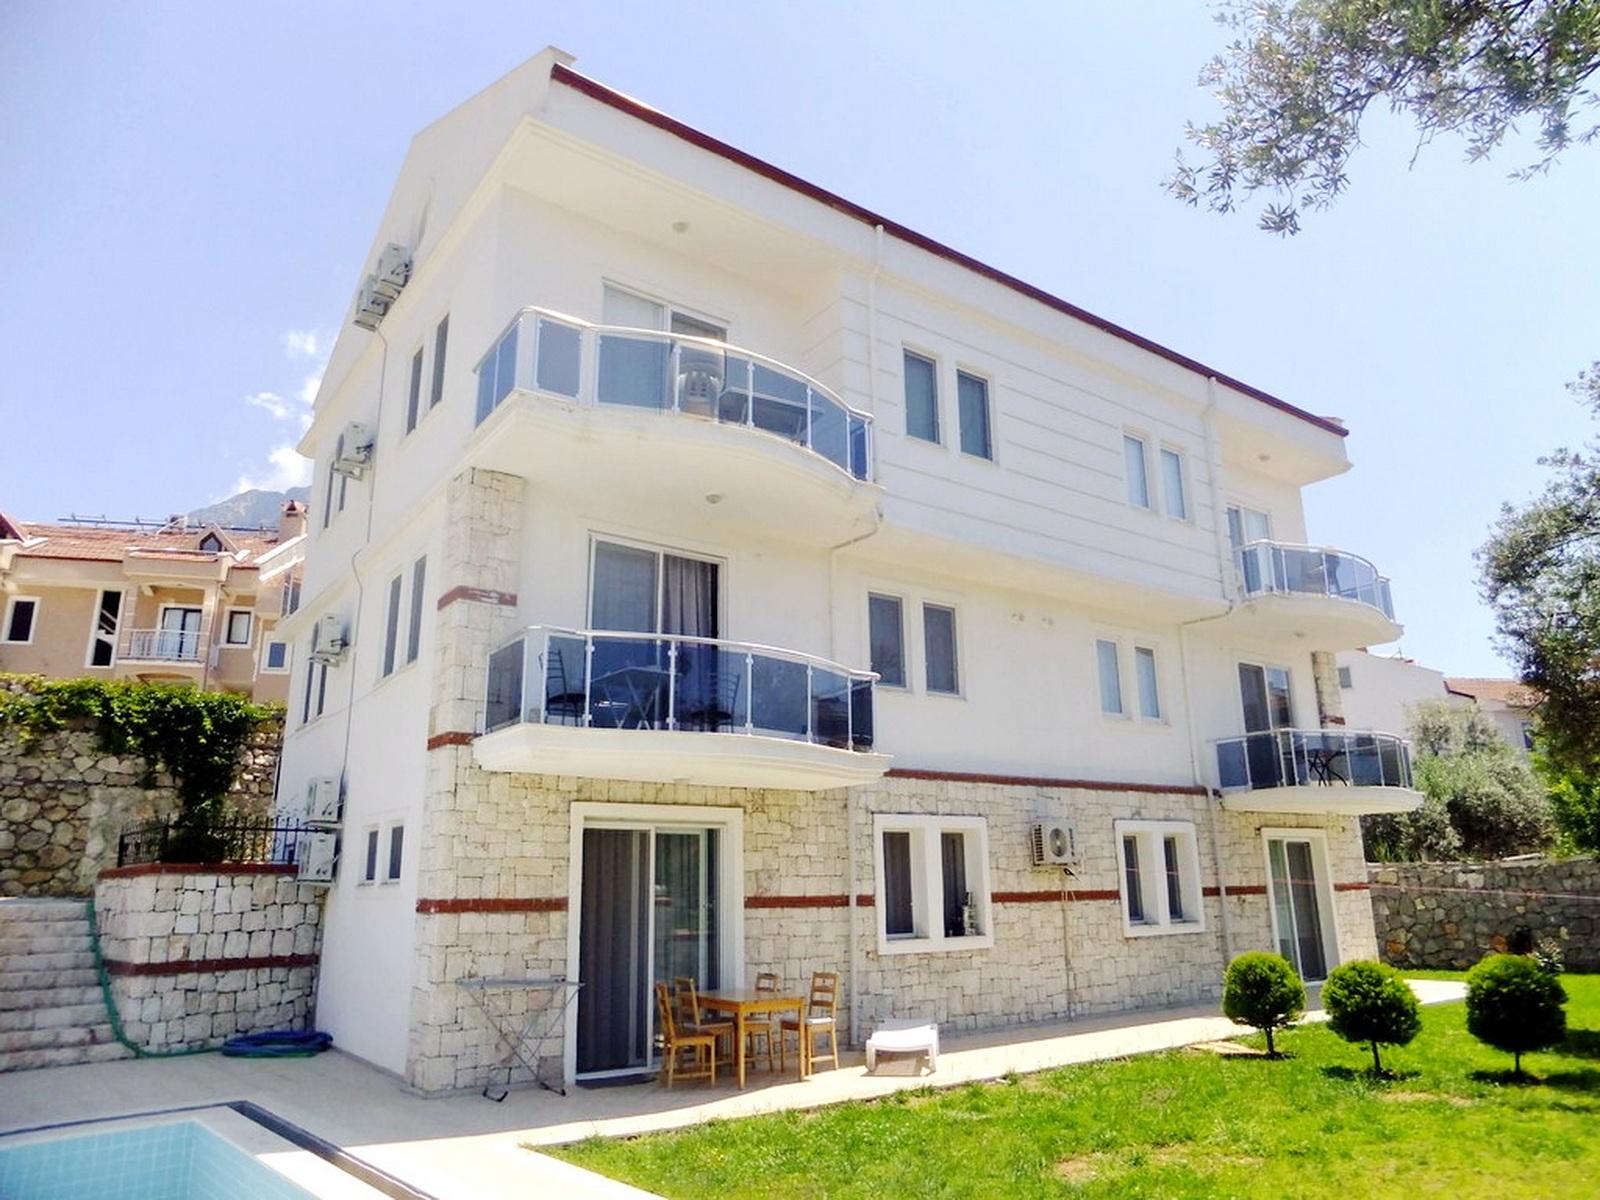 Fully Furnished 3 Bedroom Duplex Apartment in Ovacik Fethiye